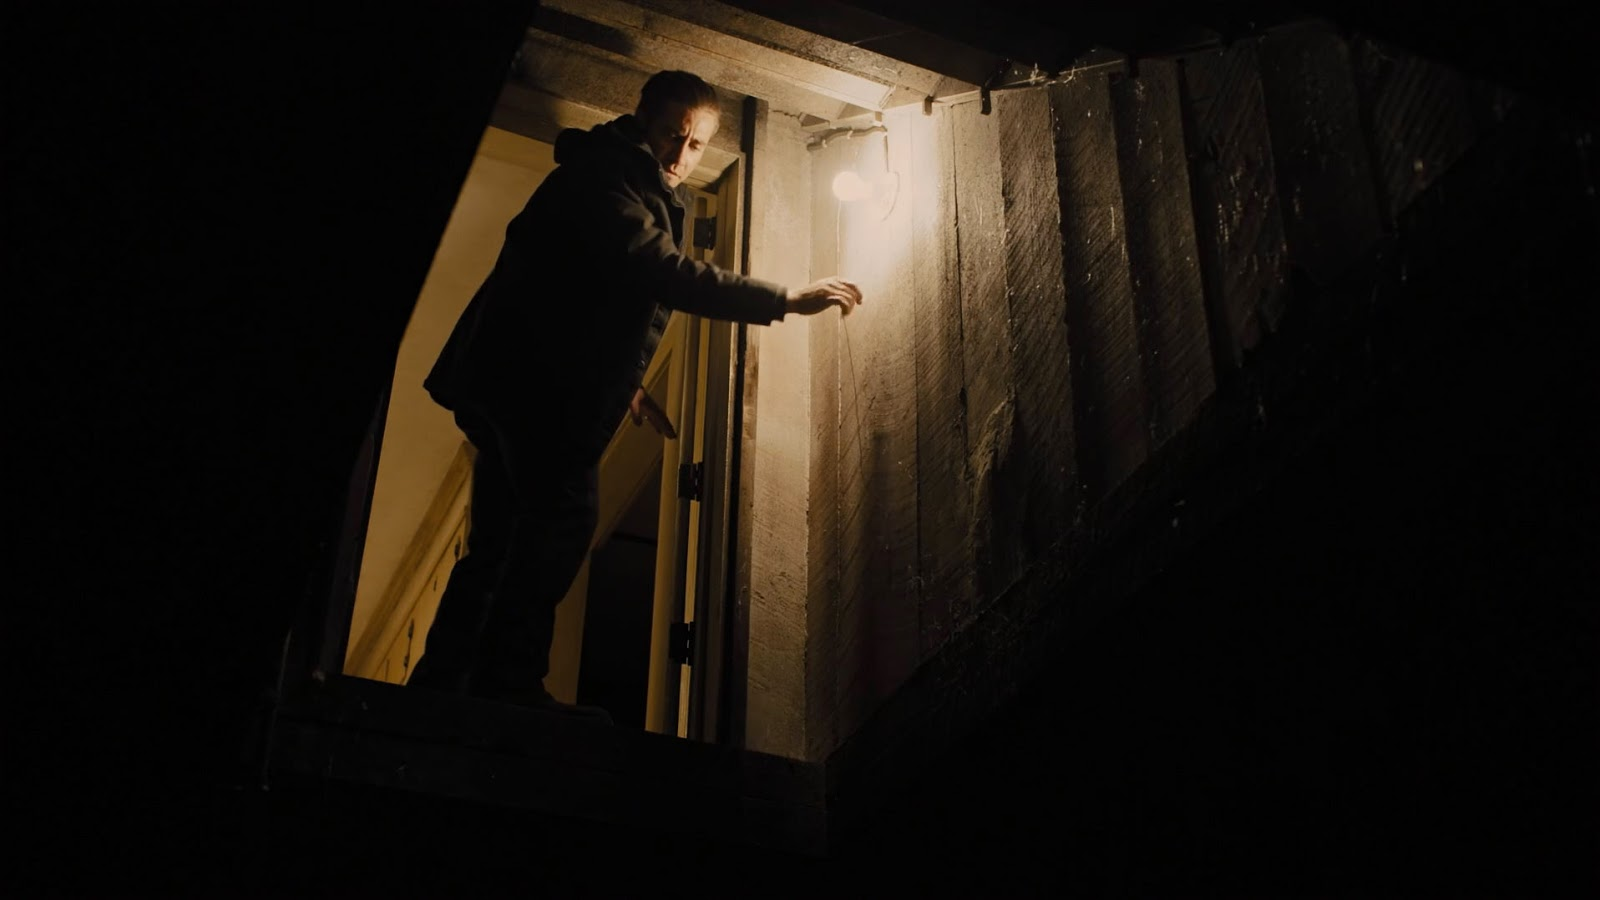 dark basement hd. Minimalist Lighting On A Pictorial Level, This Act Serves As One Of The Film\u0027s Most Open Expressions \u0027Loki-brings-light-into-darkness\u0027 Symbolism Dark Basement Hd B